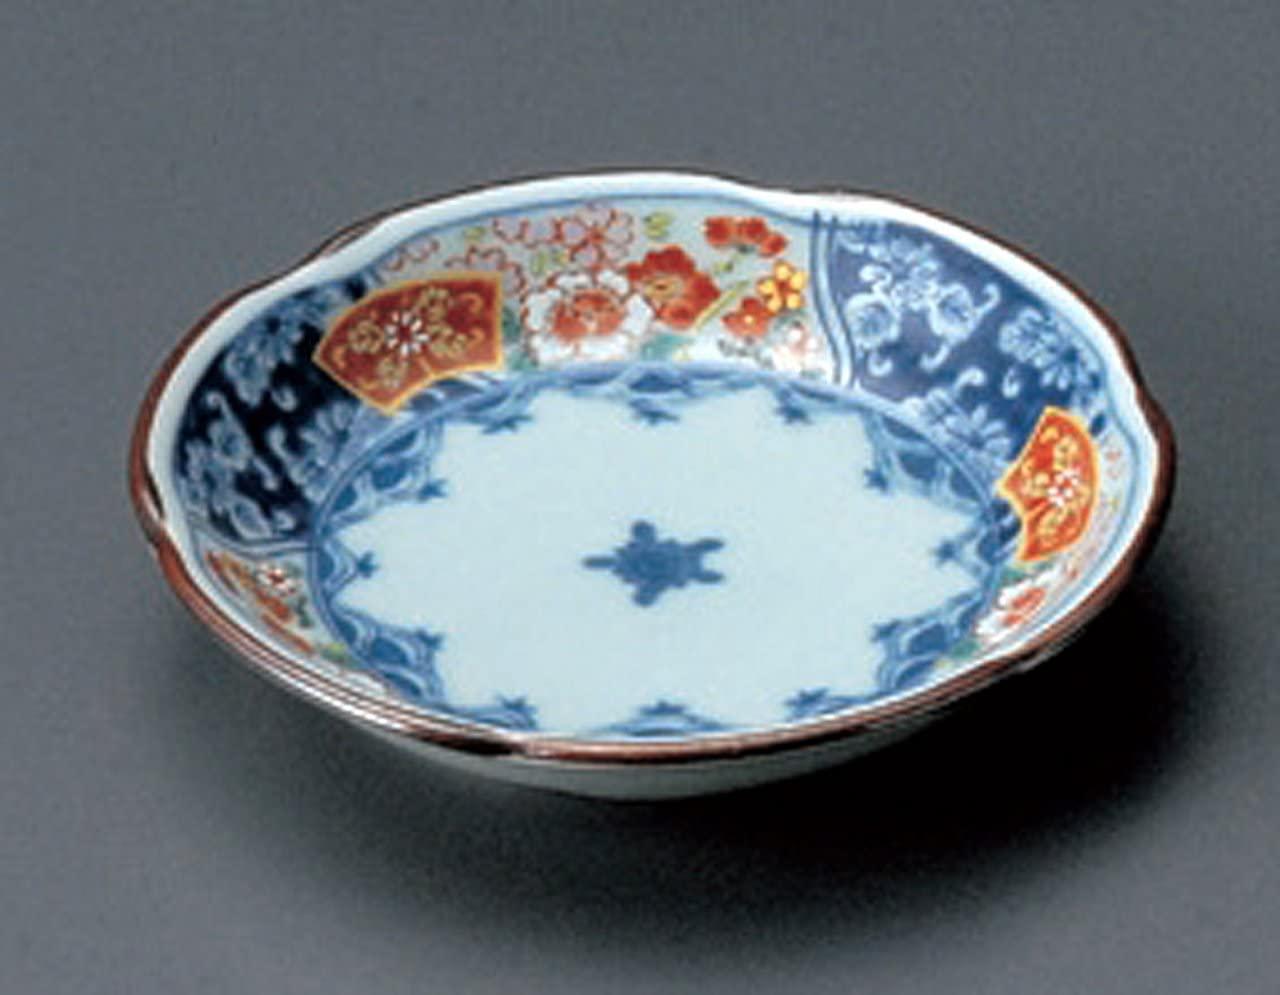 ARITA-YAKI SOME-NISHIKI Jiki Japanese Porcelain Set of 2 Small Plates